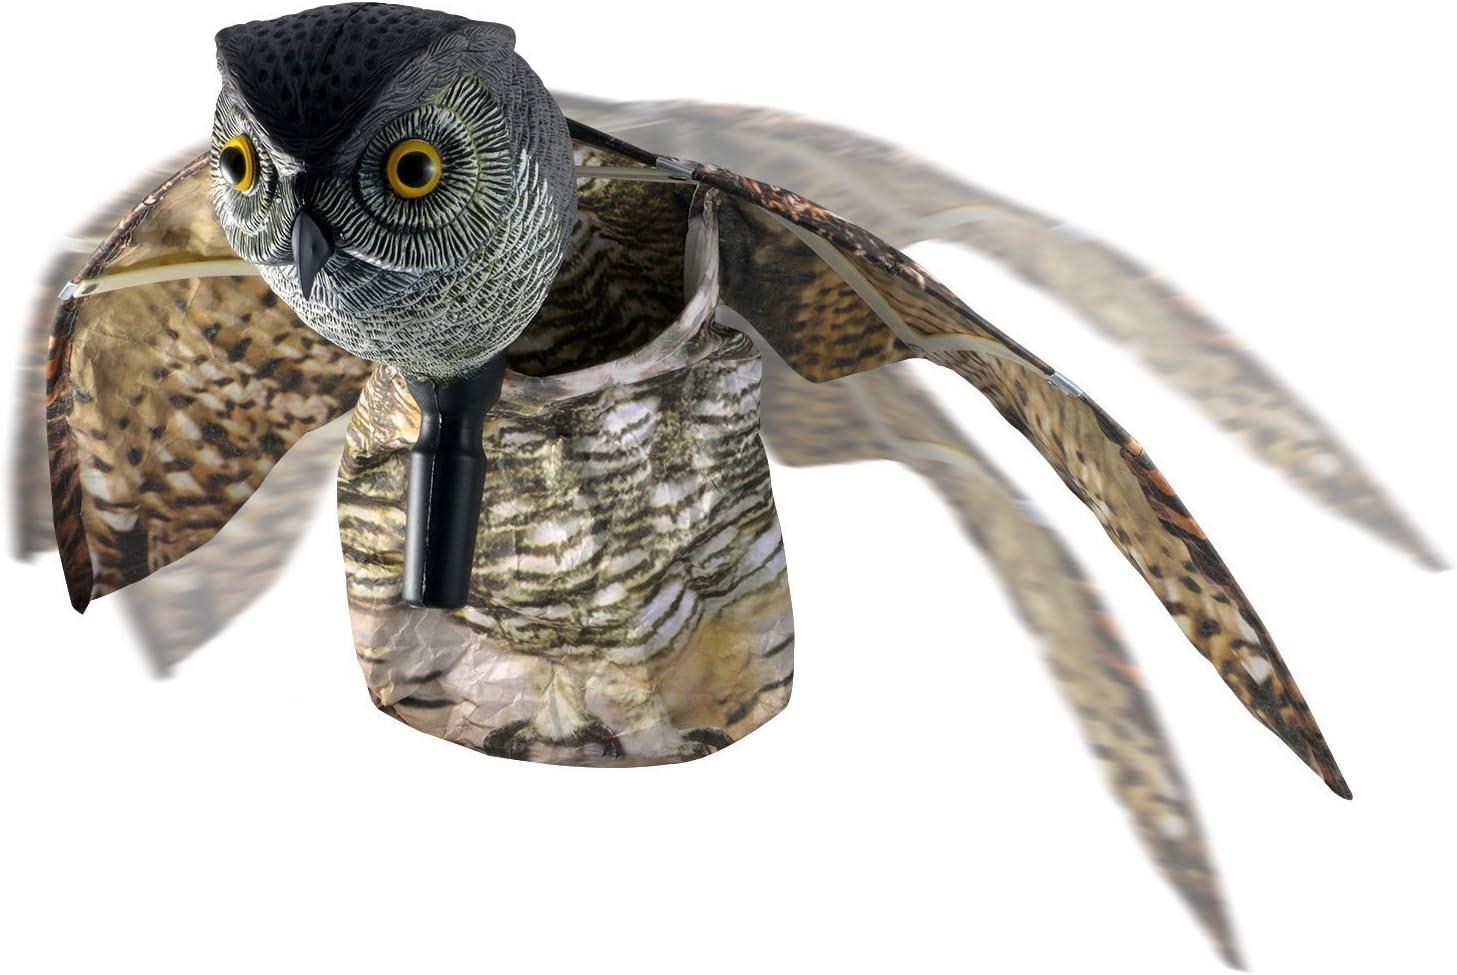 Skycabin natural espantapájaros falsos búho pest disuasión con las alas en movimiento - aves de miedo, roedores, plagas lejos